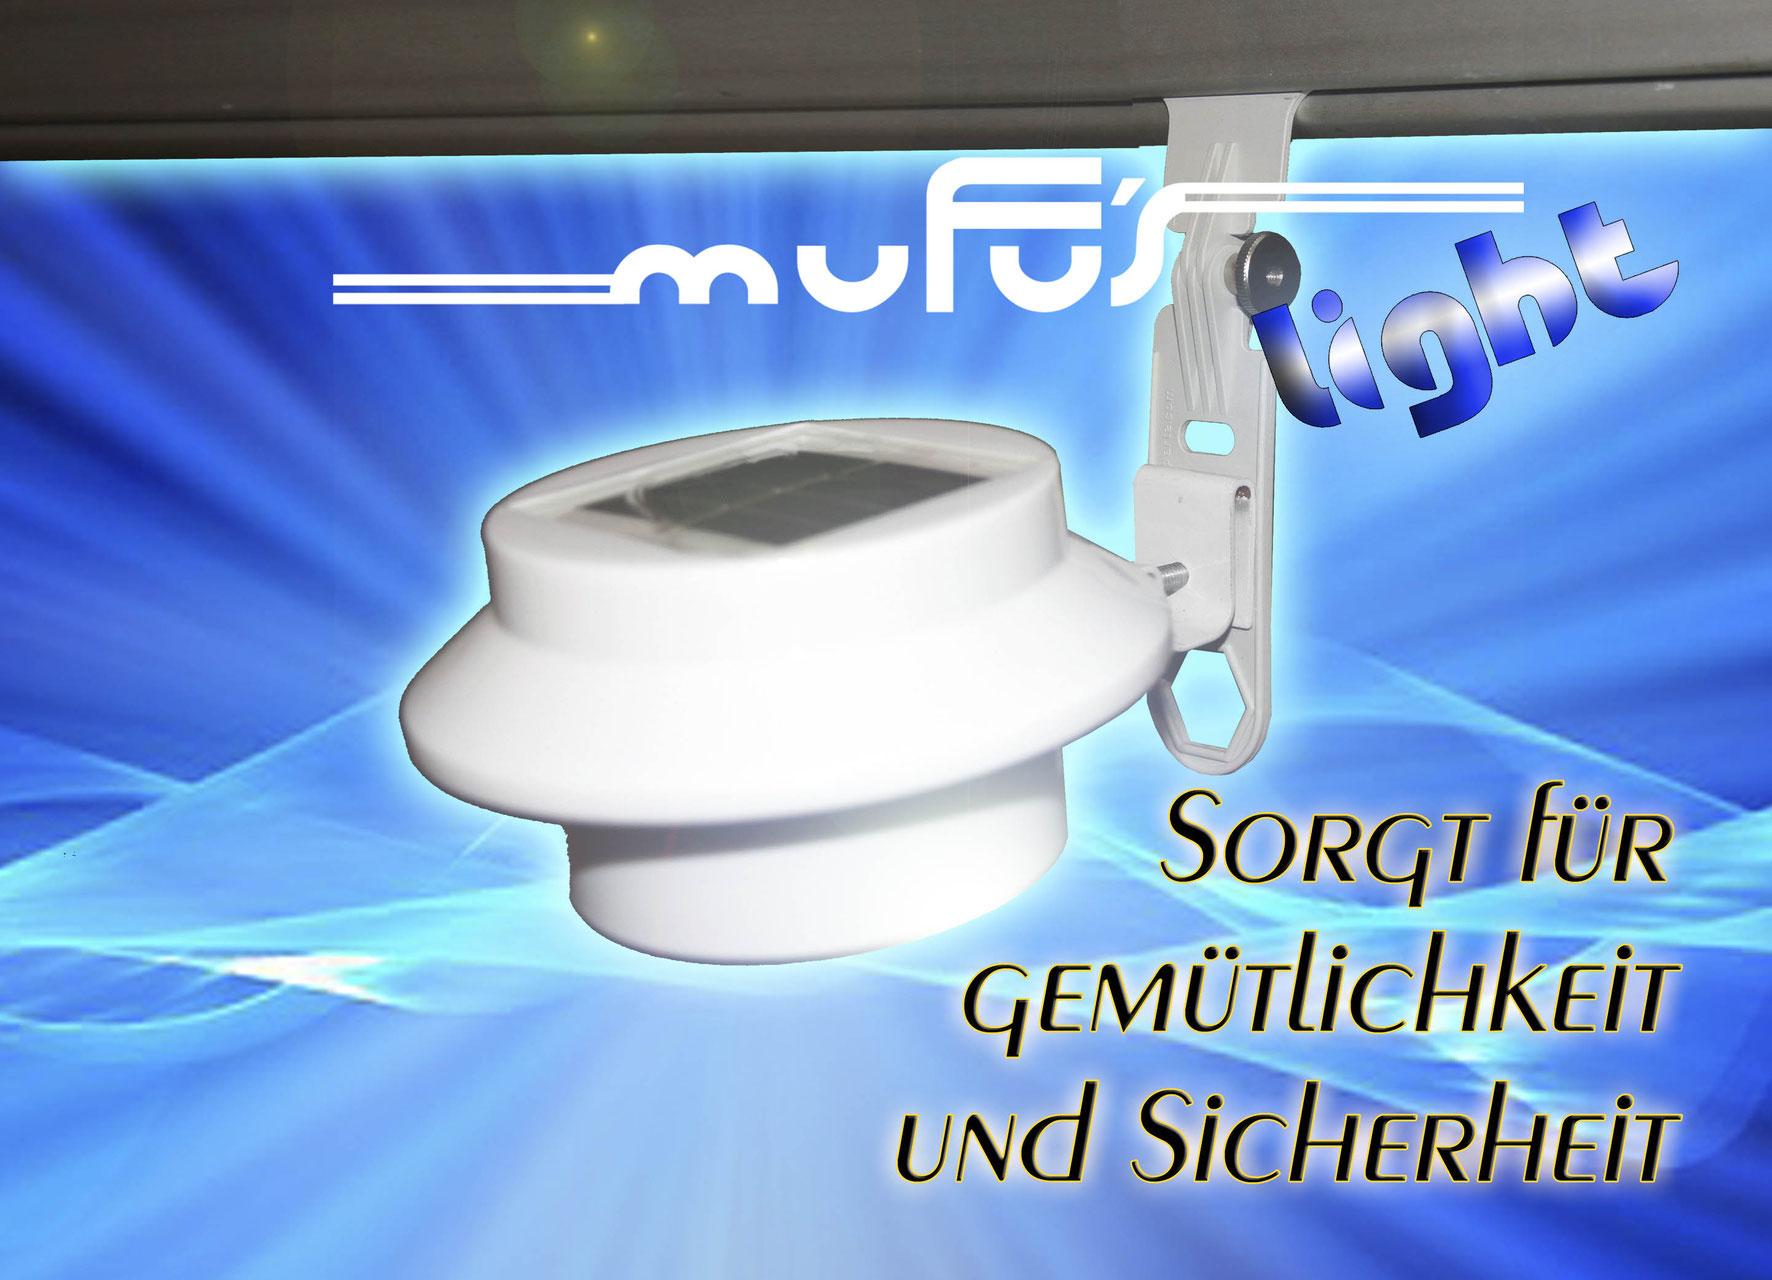 mufu0000